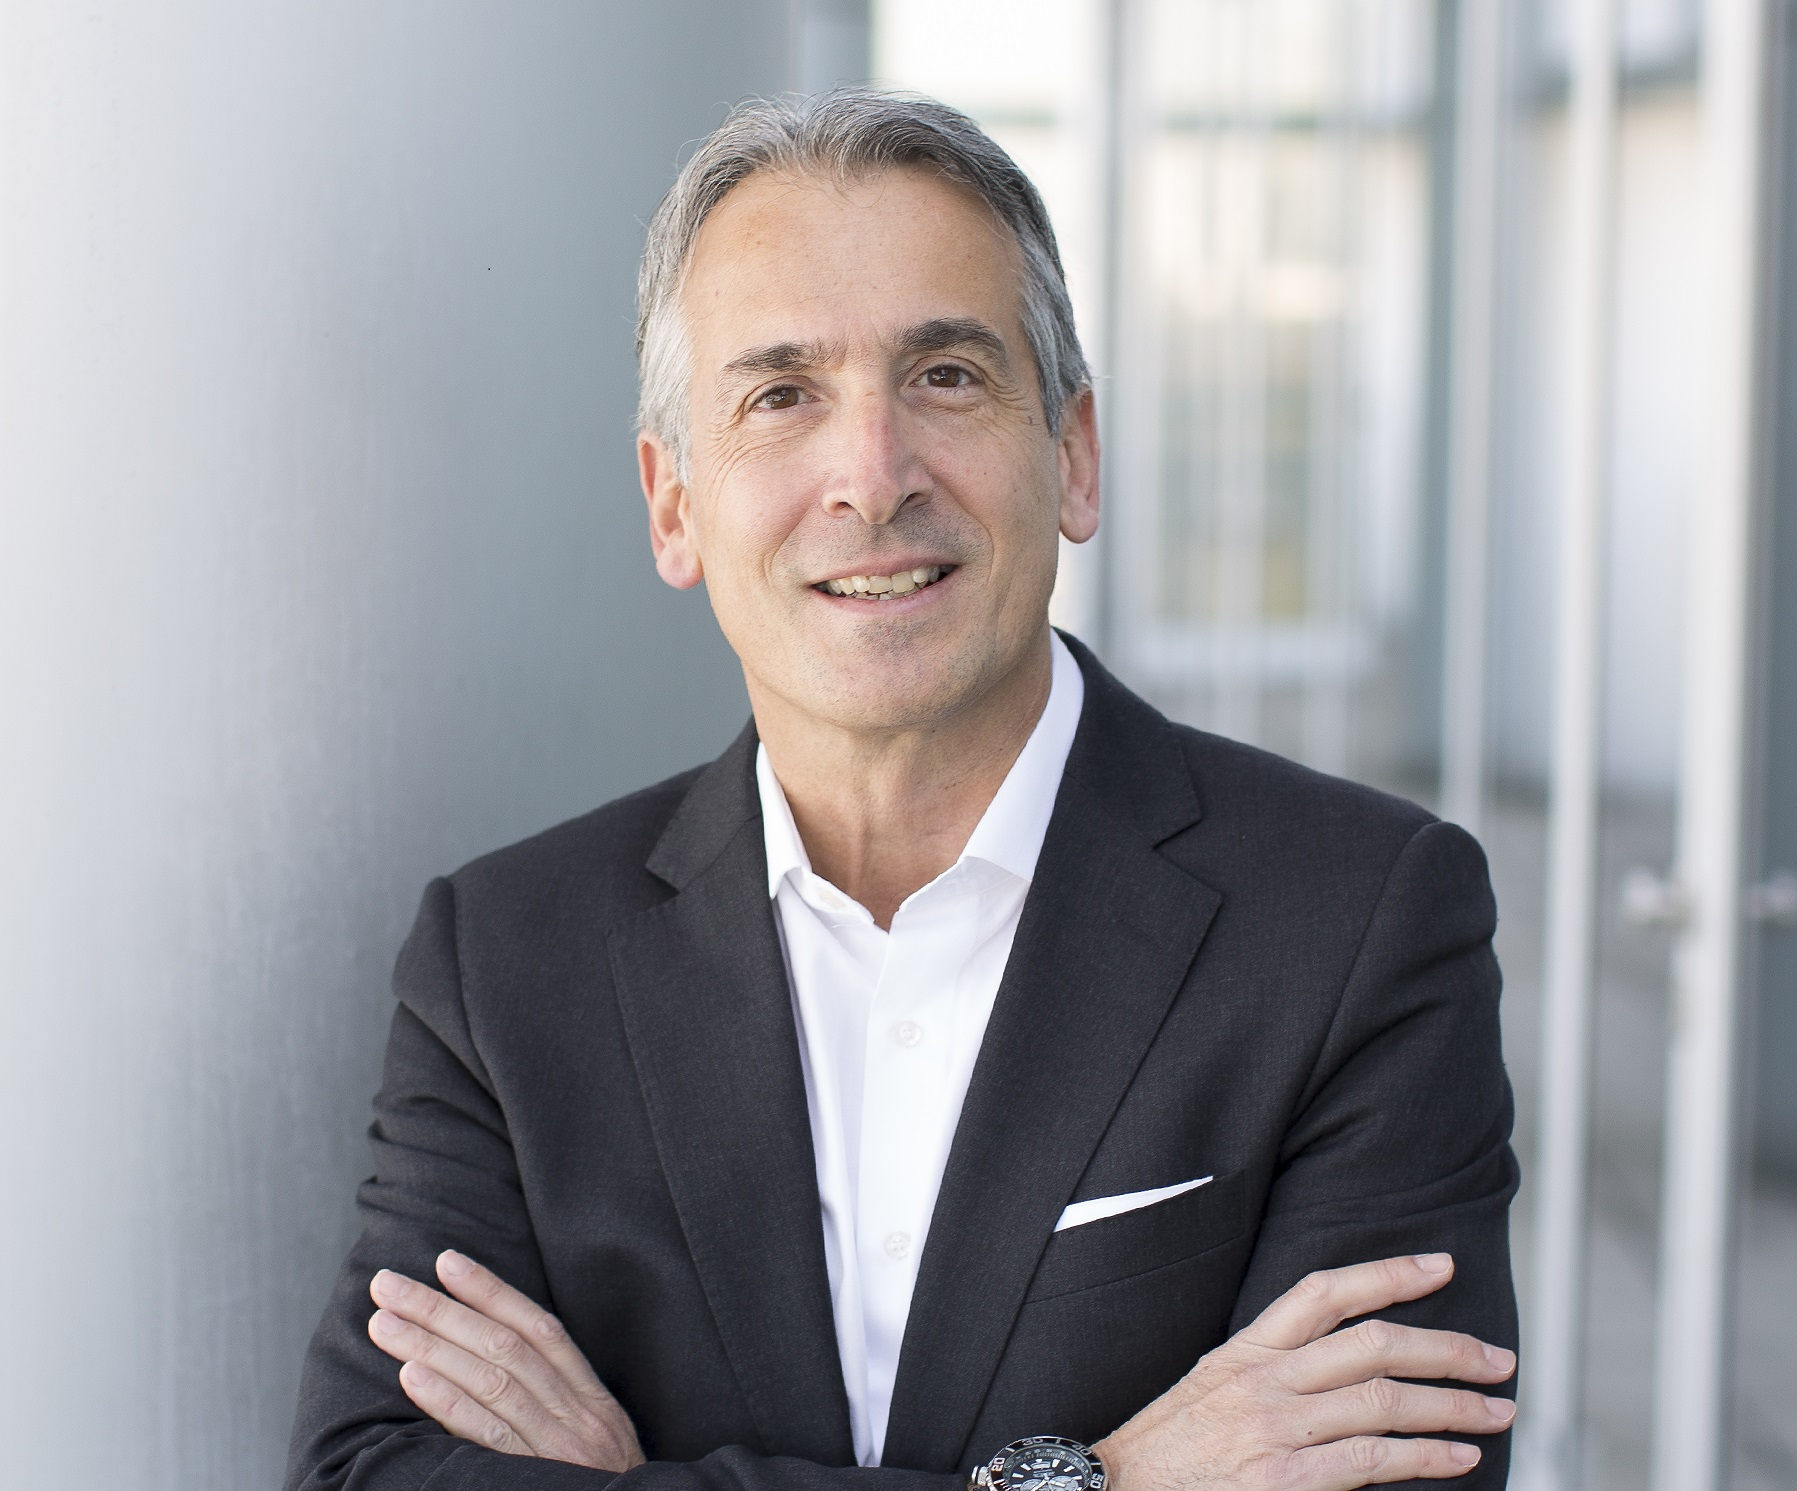 Interview with Emilio Herrera, COO of Kia Motors Europe